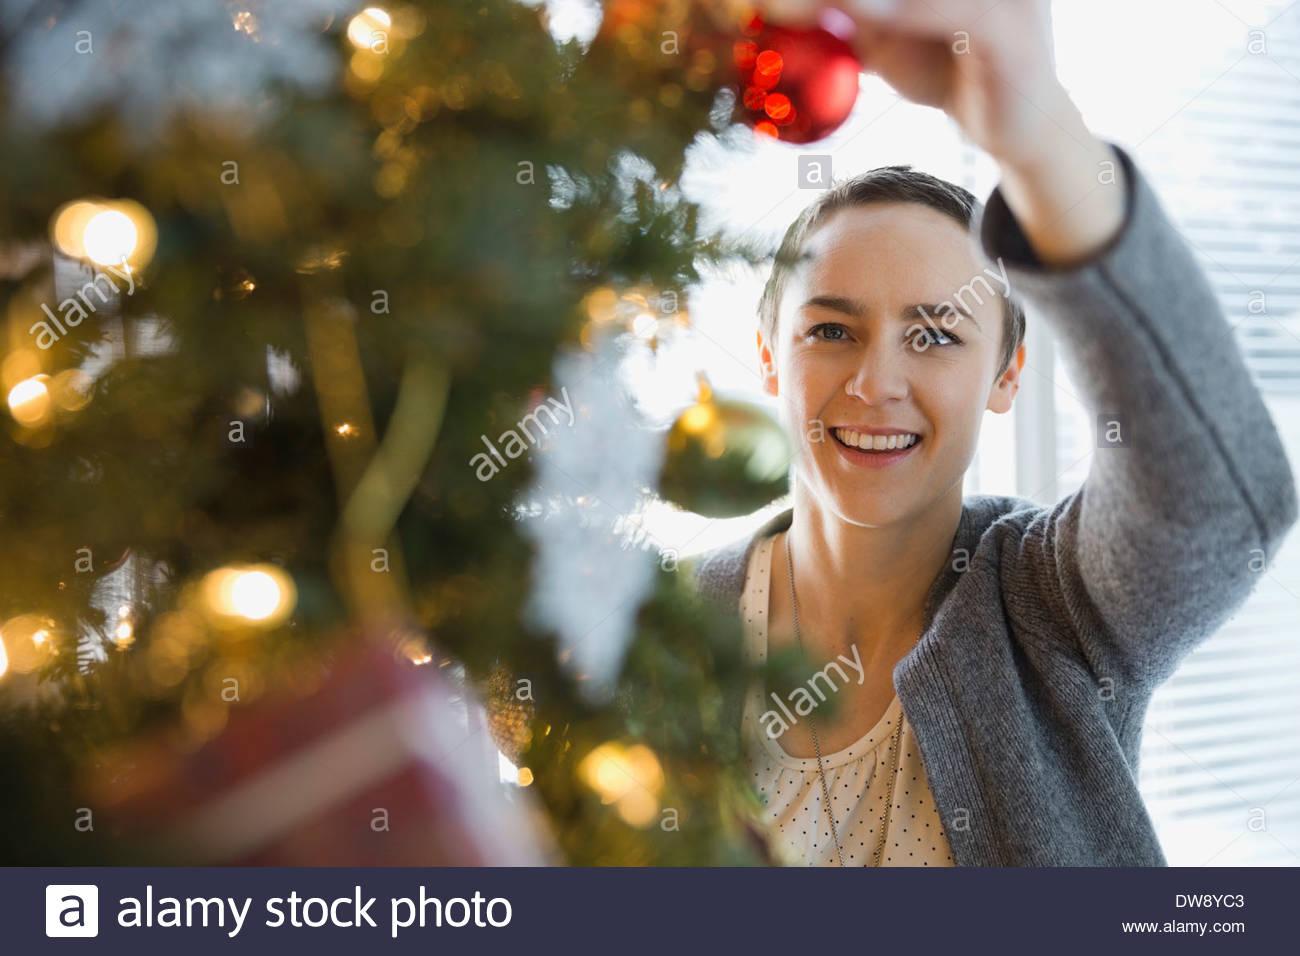 Woman decorating Christmas tree at home - Stock Image